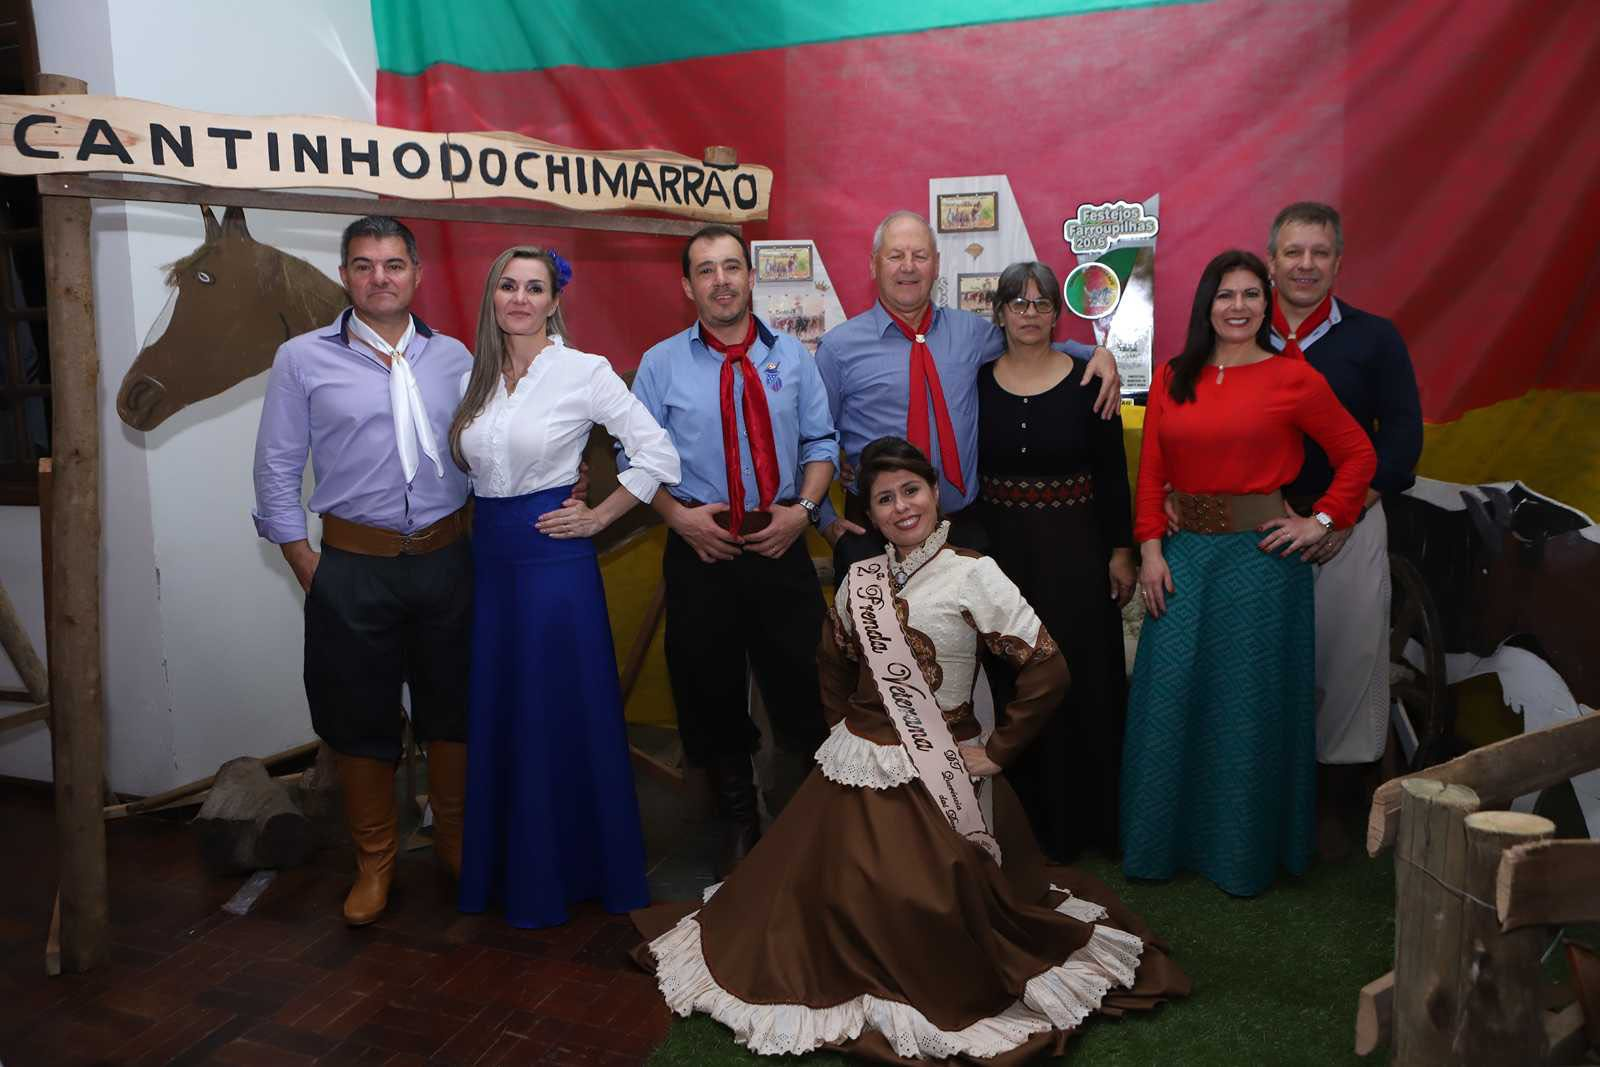 Semana Farroupilha 2019 - Jantar Fandango